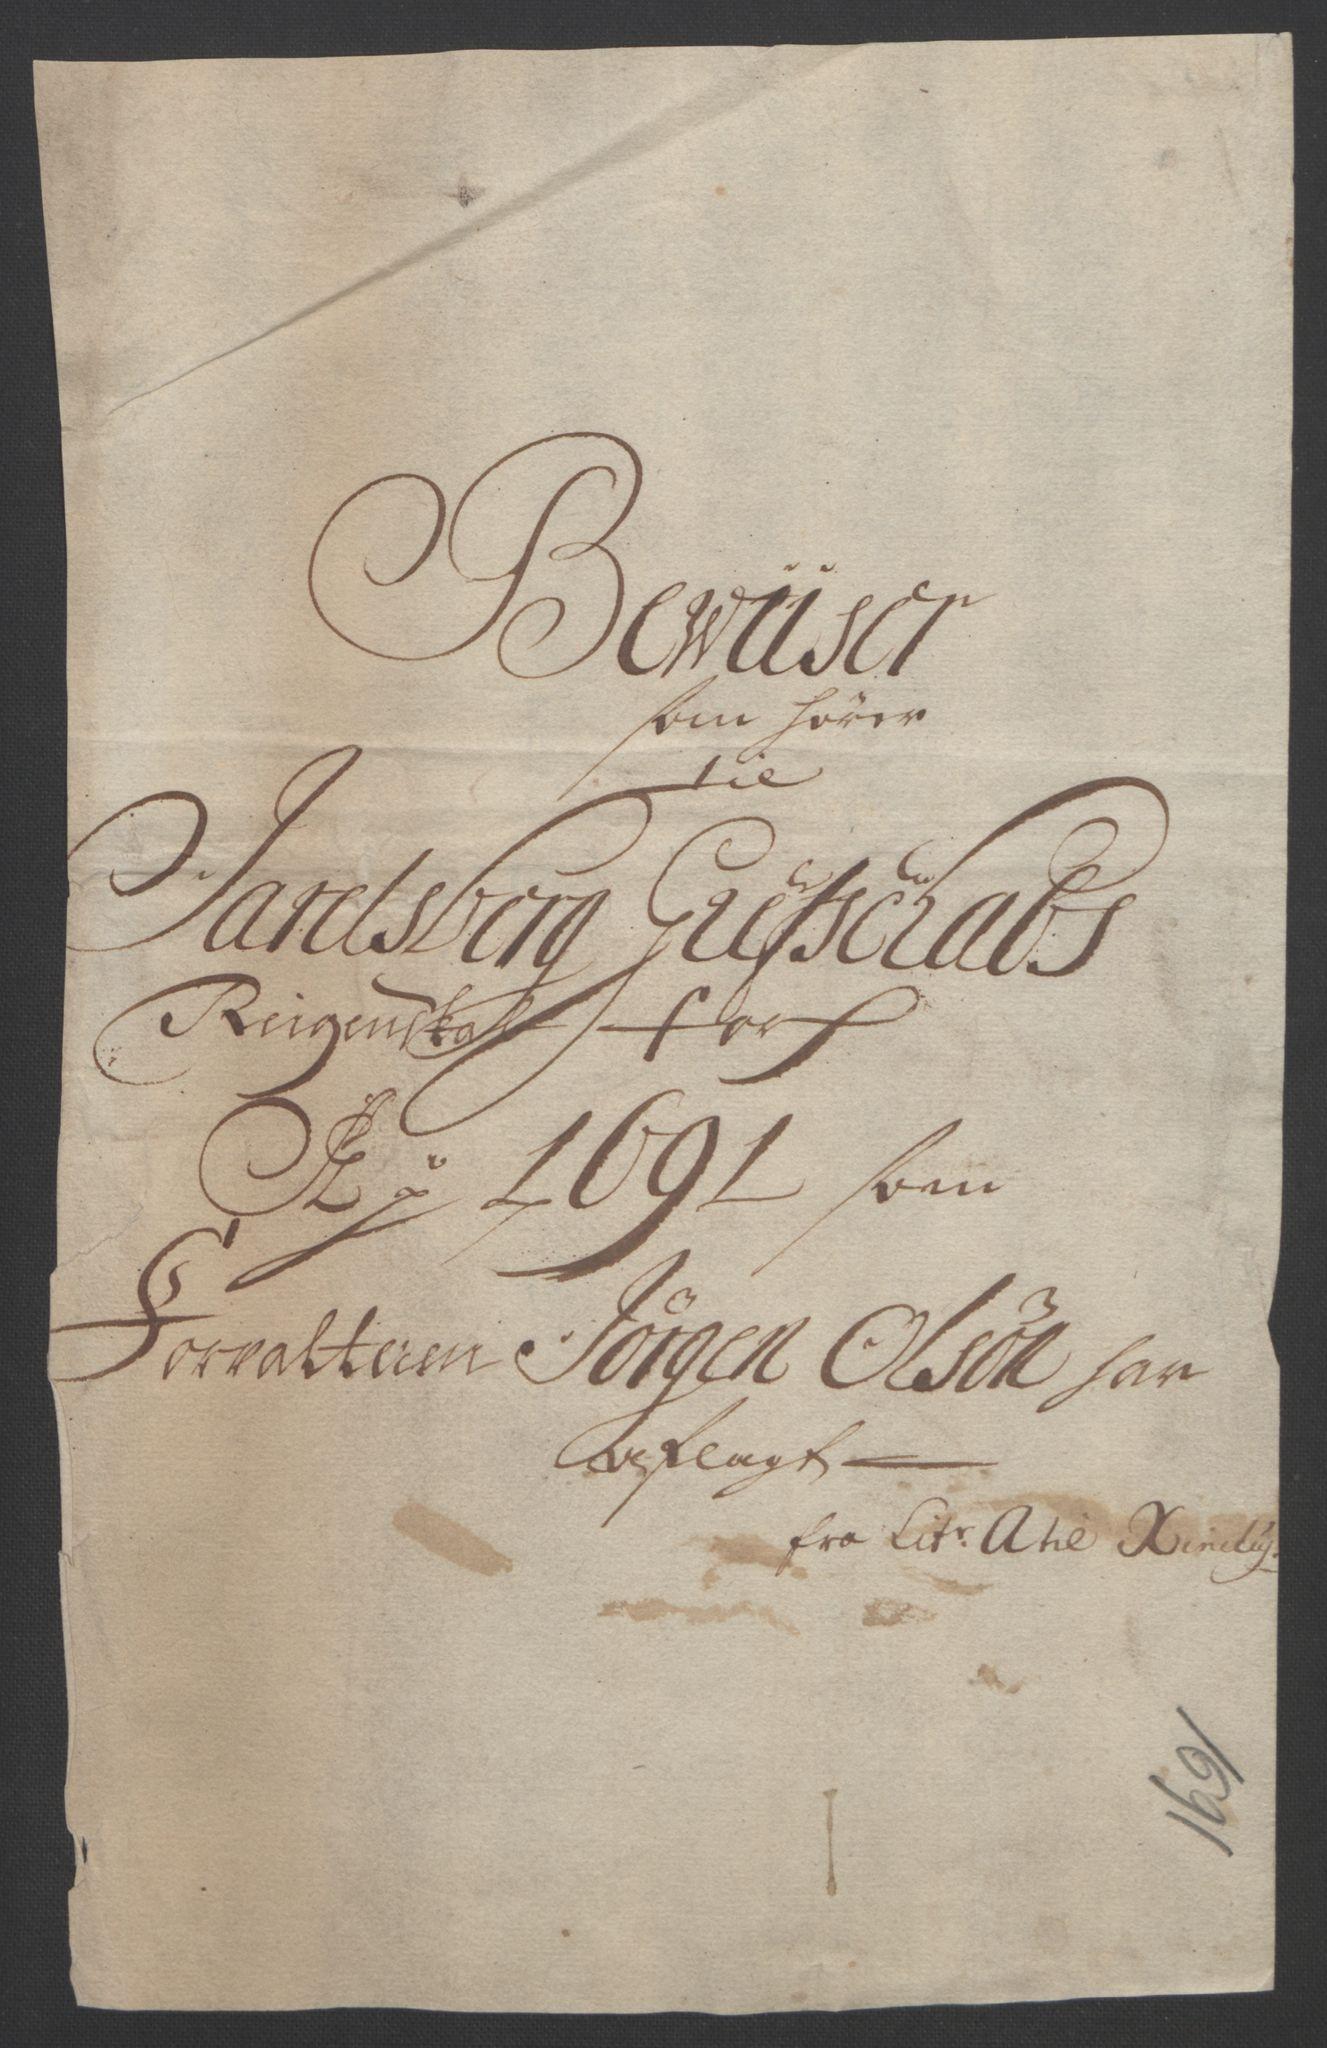 RA, Rentekammeret inntil 1814, Reviderte regnskaper, Fogderegnskap, R32/L1864: Fogderegnskap Jarlsberg grevskap, 1691, s. 451